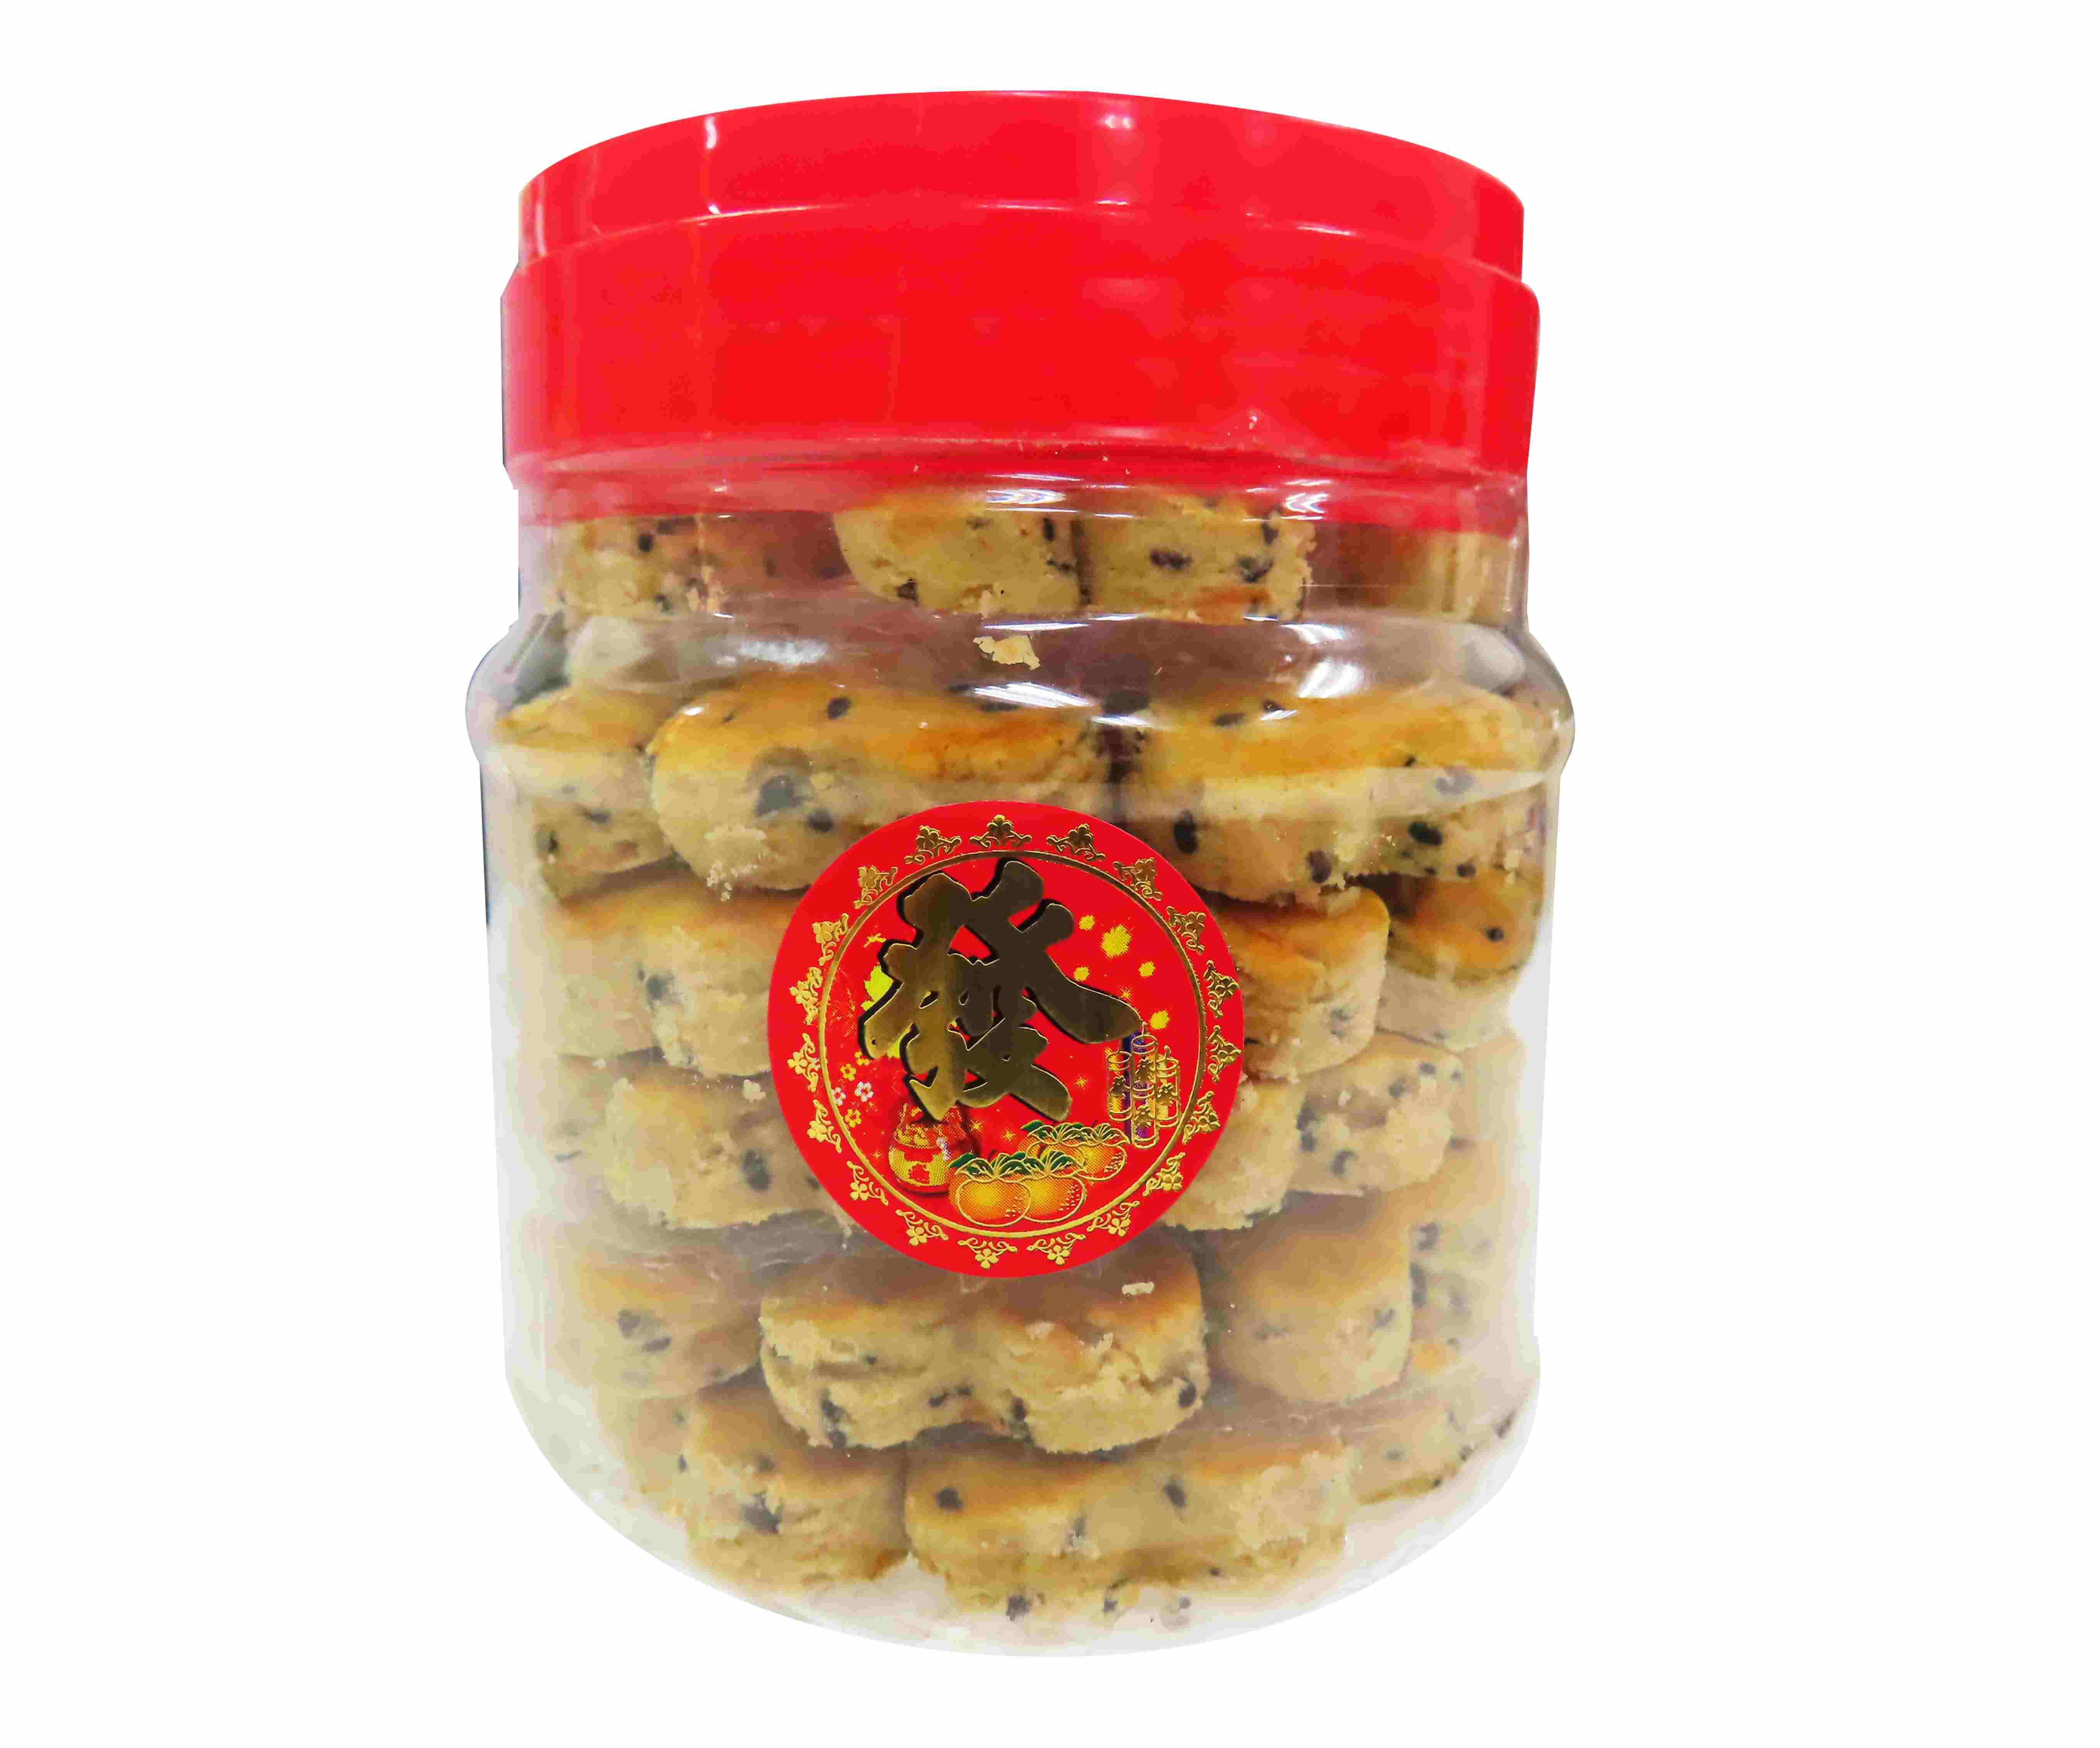 Image Vegetarian Green Pea S5善缘 - 素绿豆饼 (纯素) 300grams